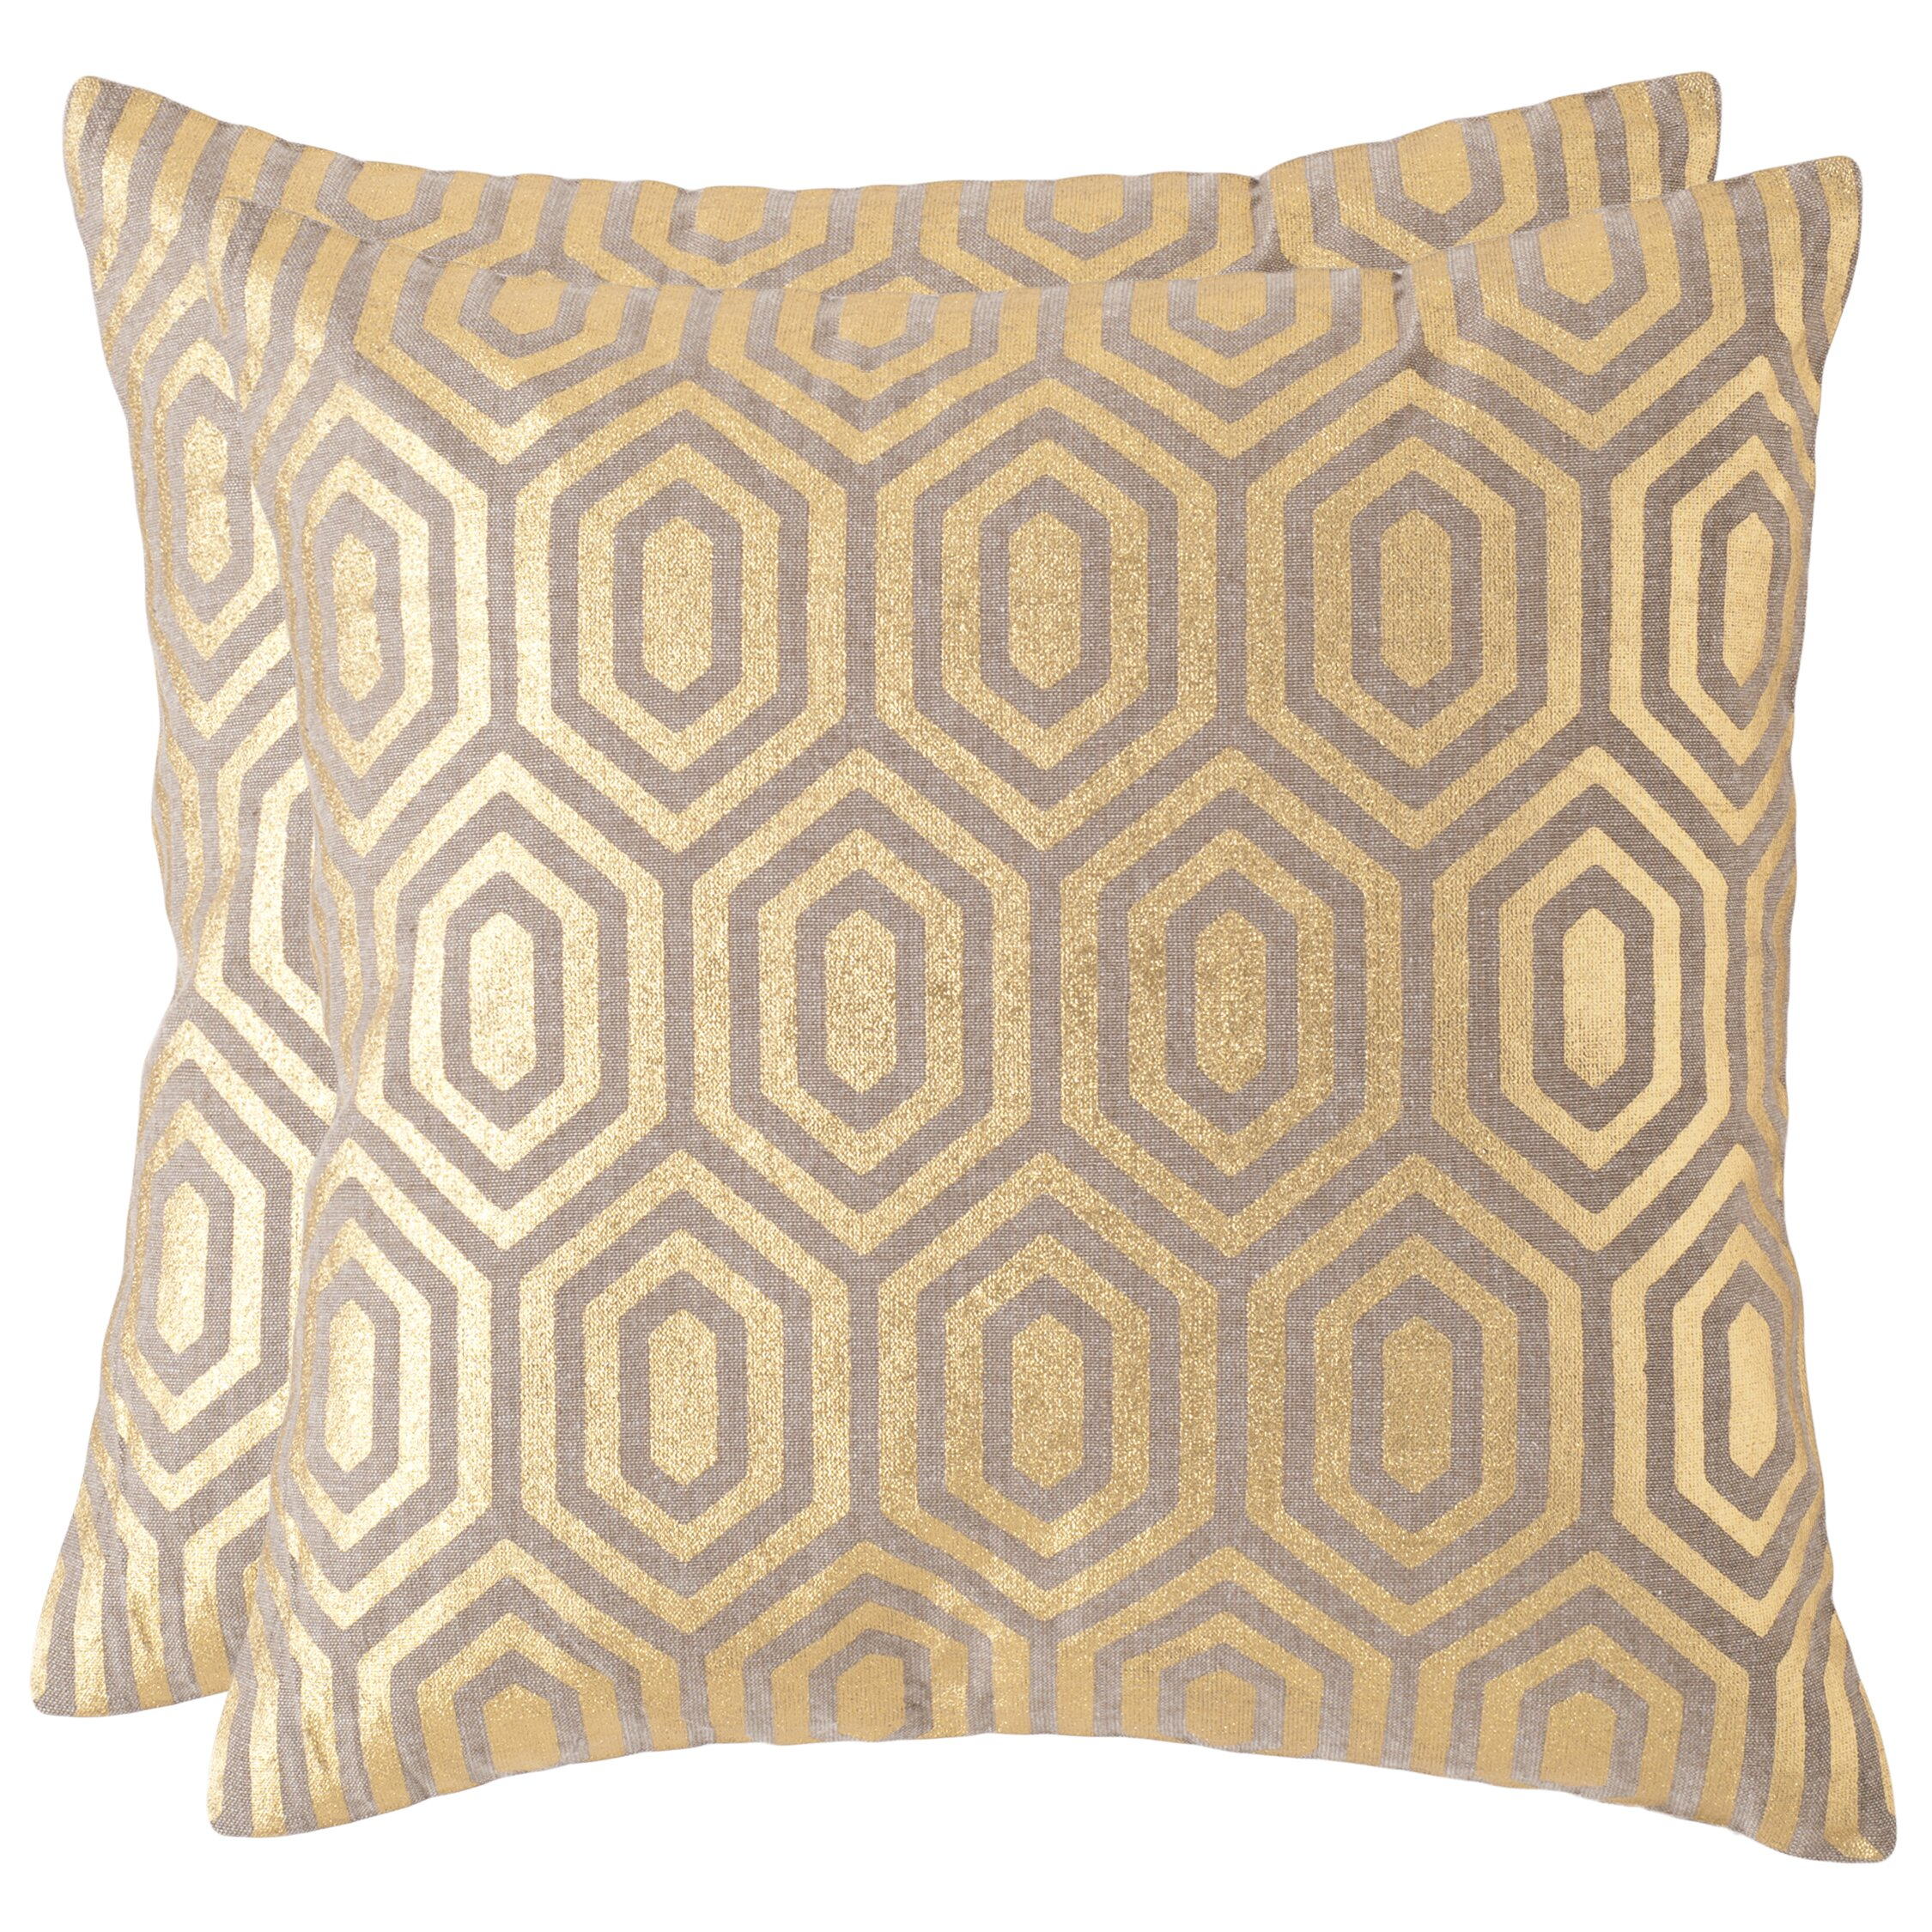 House of hampton roberdeau linen throw pillow reviews for Buy hampton inn pillows